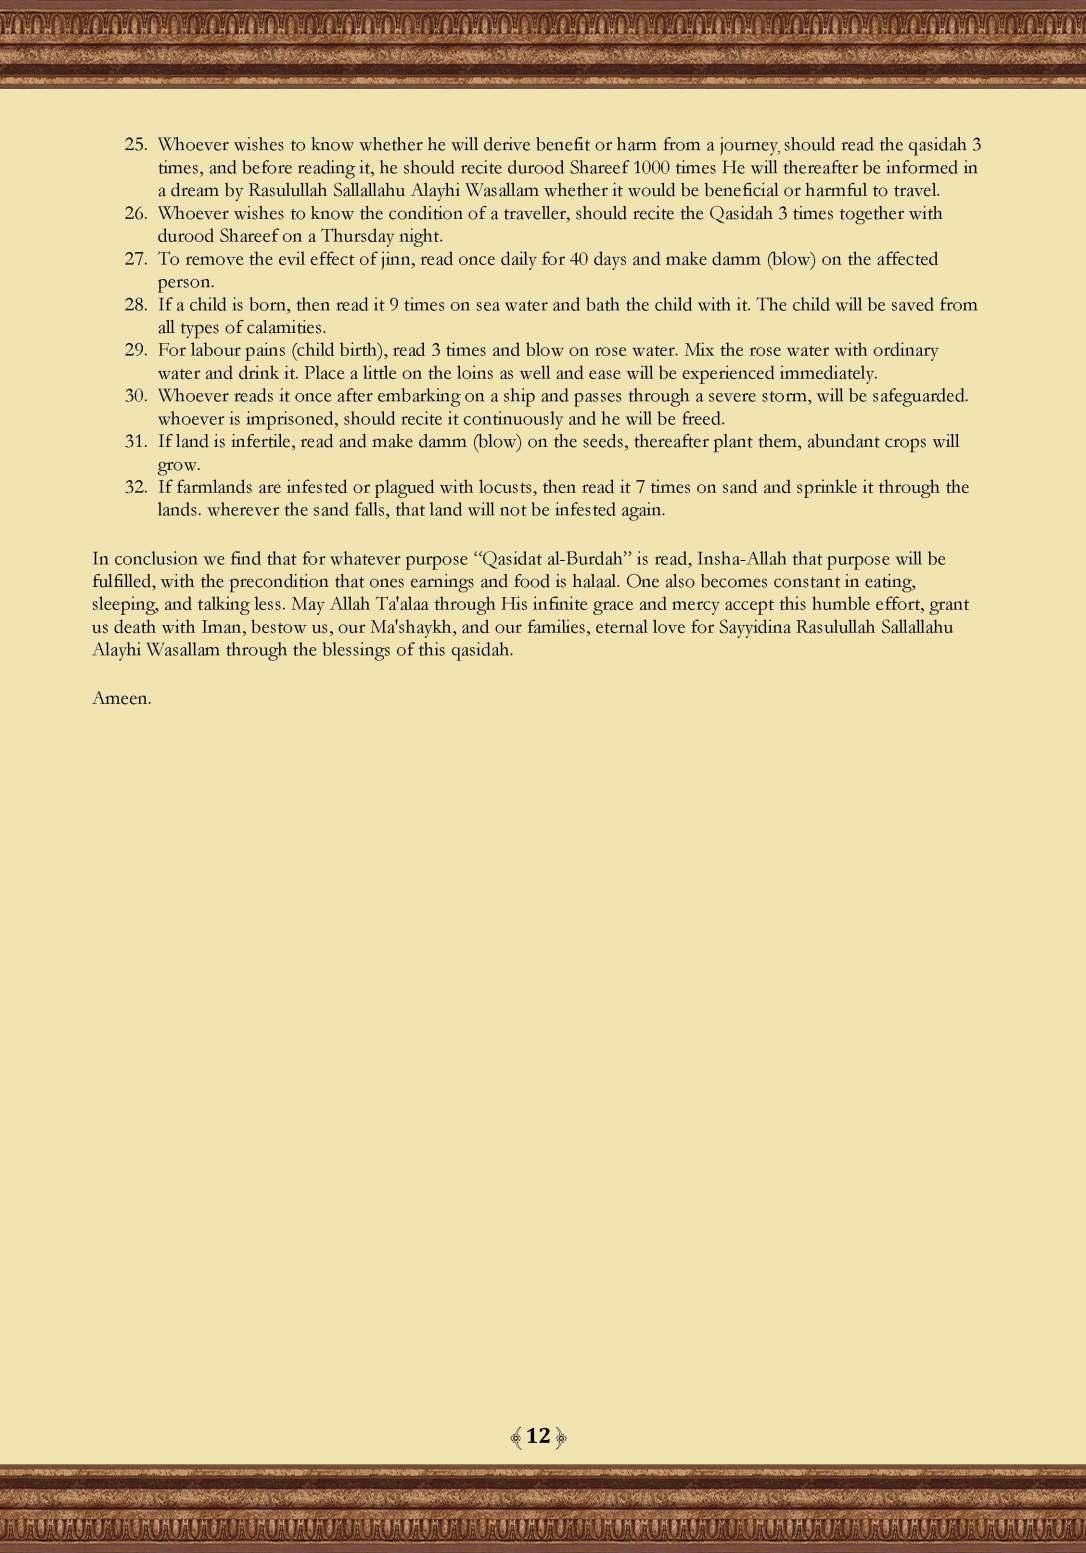 Qasidat_al-Burda_Page_12